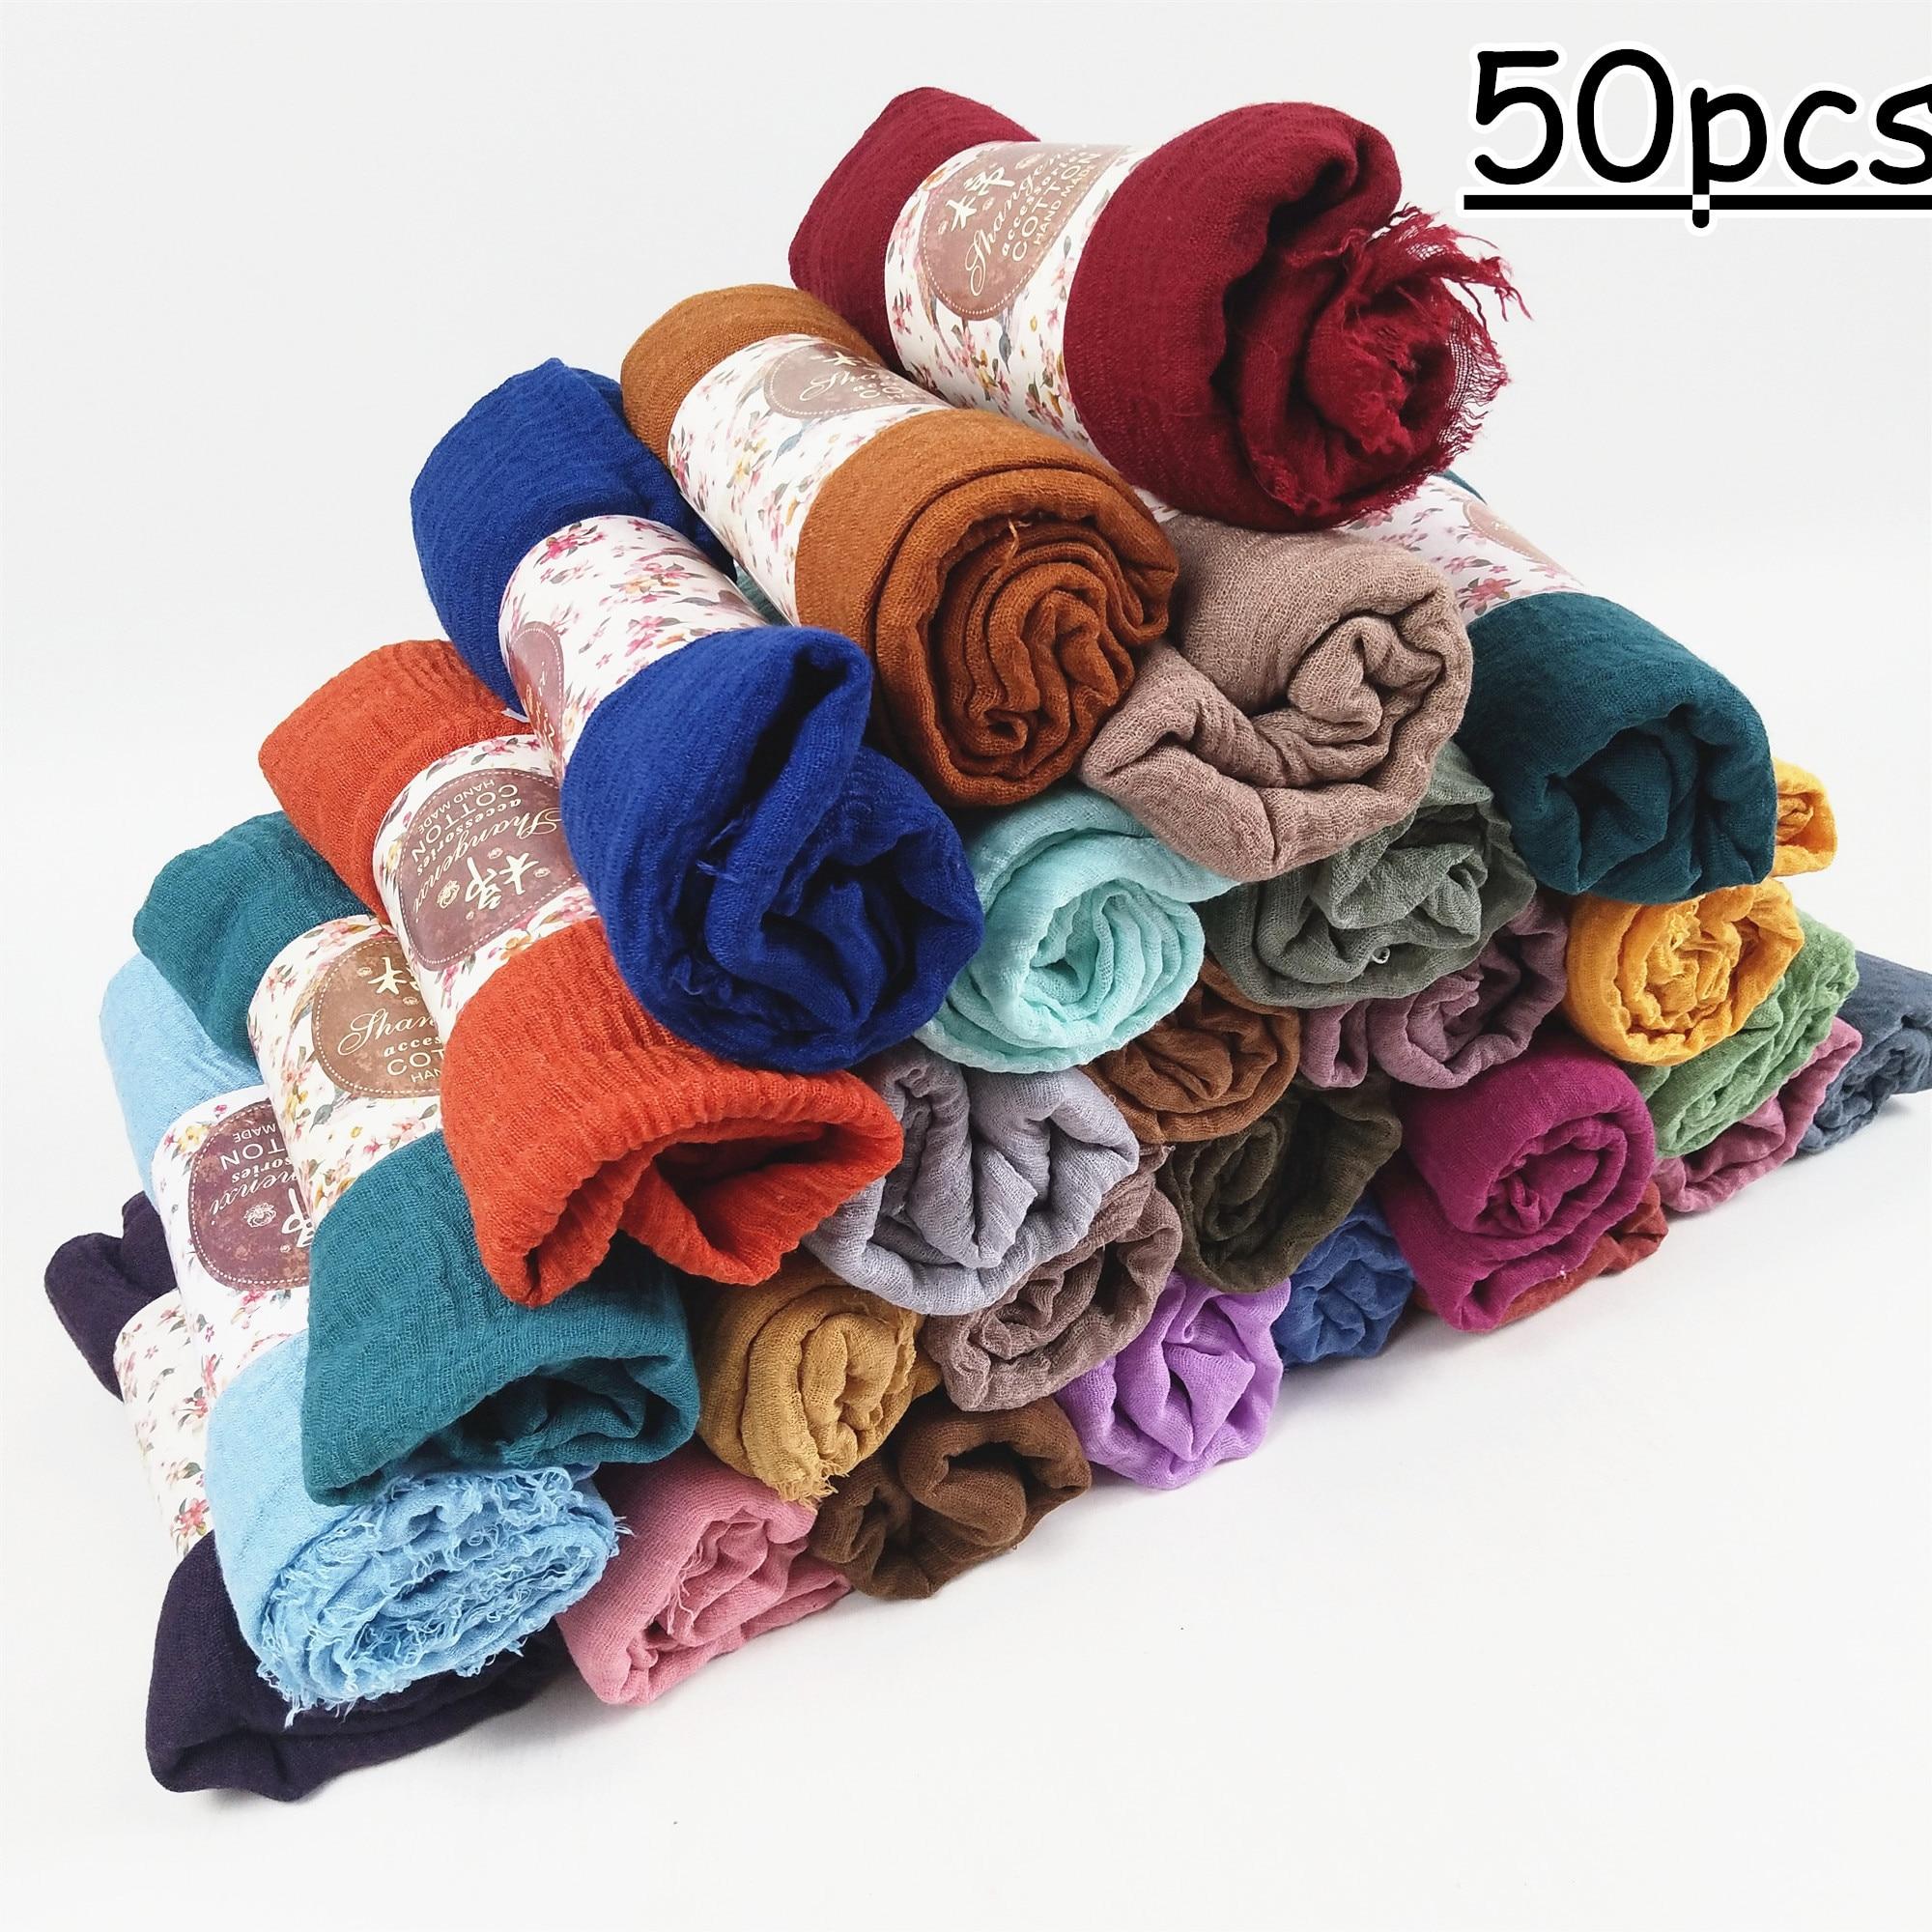 J4  Hot Sale Bubble Plain Scarf/scarves Fringes Women Soft Solid Hijabs Popular Muffler Shawls Big Pashmina Wrap